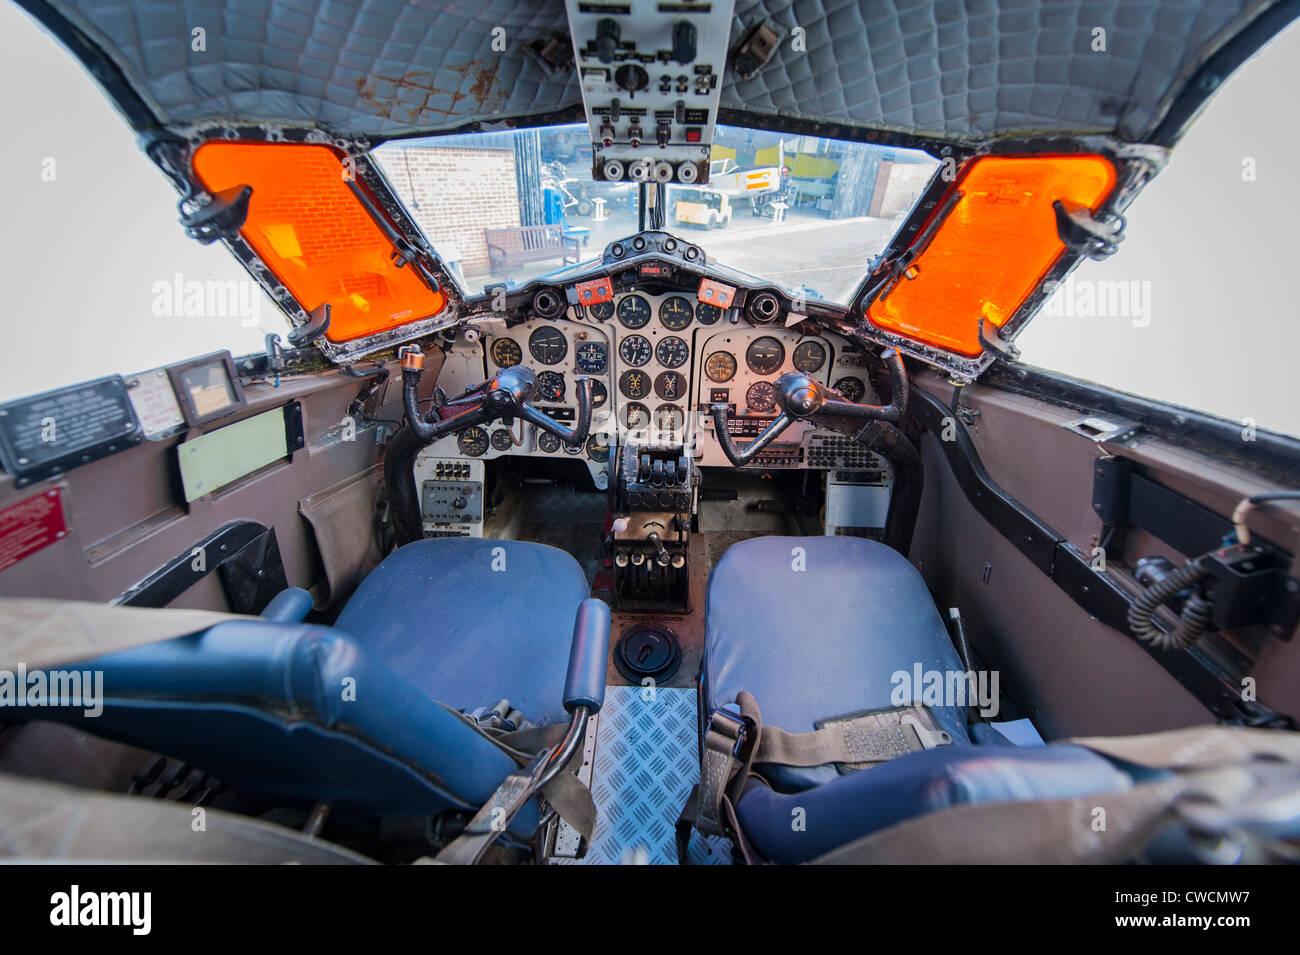 de Havilland Aircraft Heritage Centre Mosquito Museum DH114 Heron Mk.2D detail cockpit controls instruments first - Stock Image